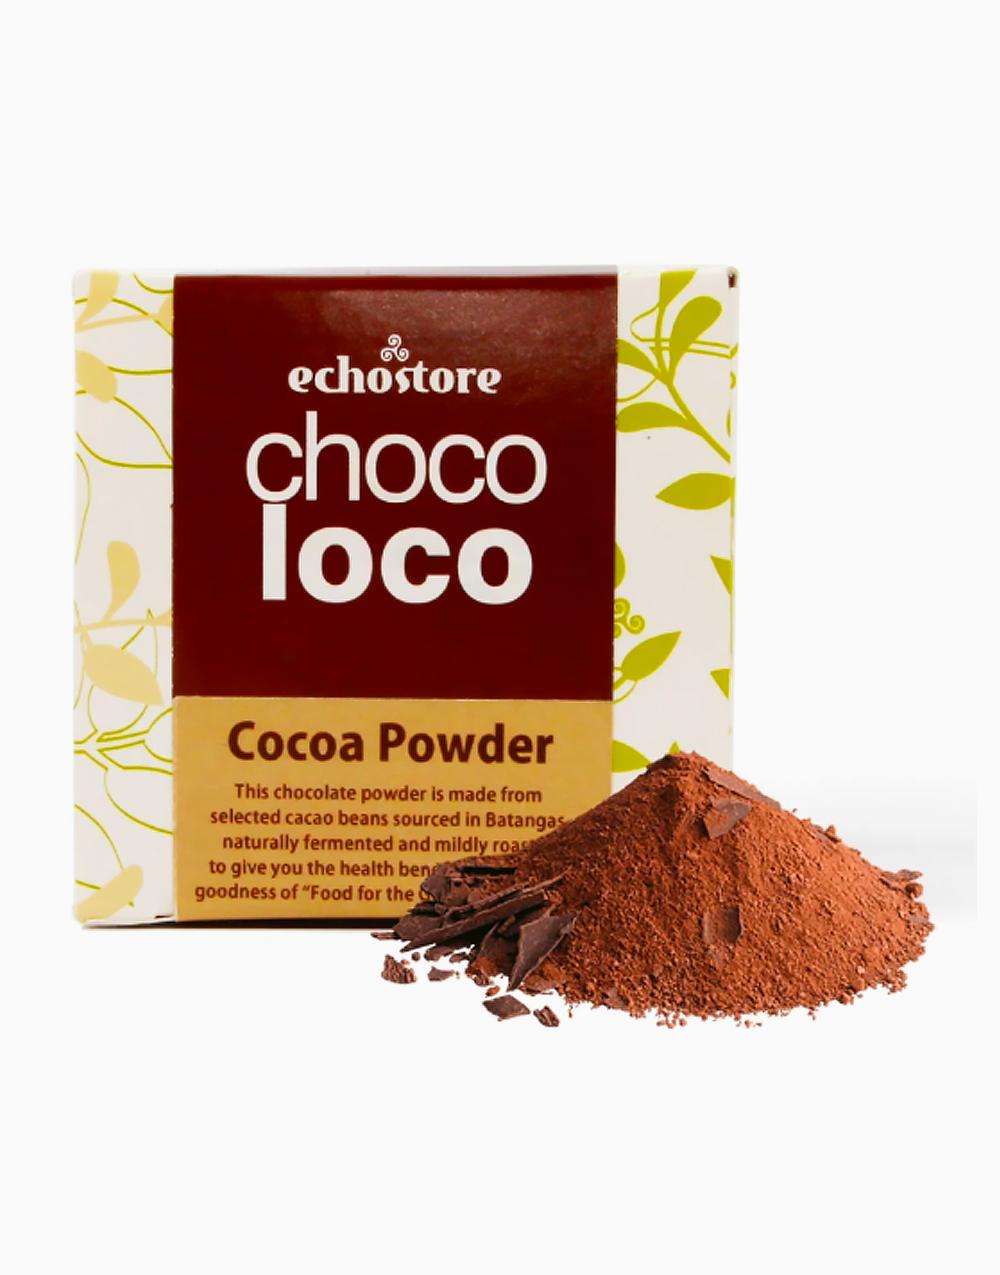 Choco Loco Cocoa Powder (150g) by ECHOstore